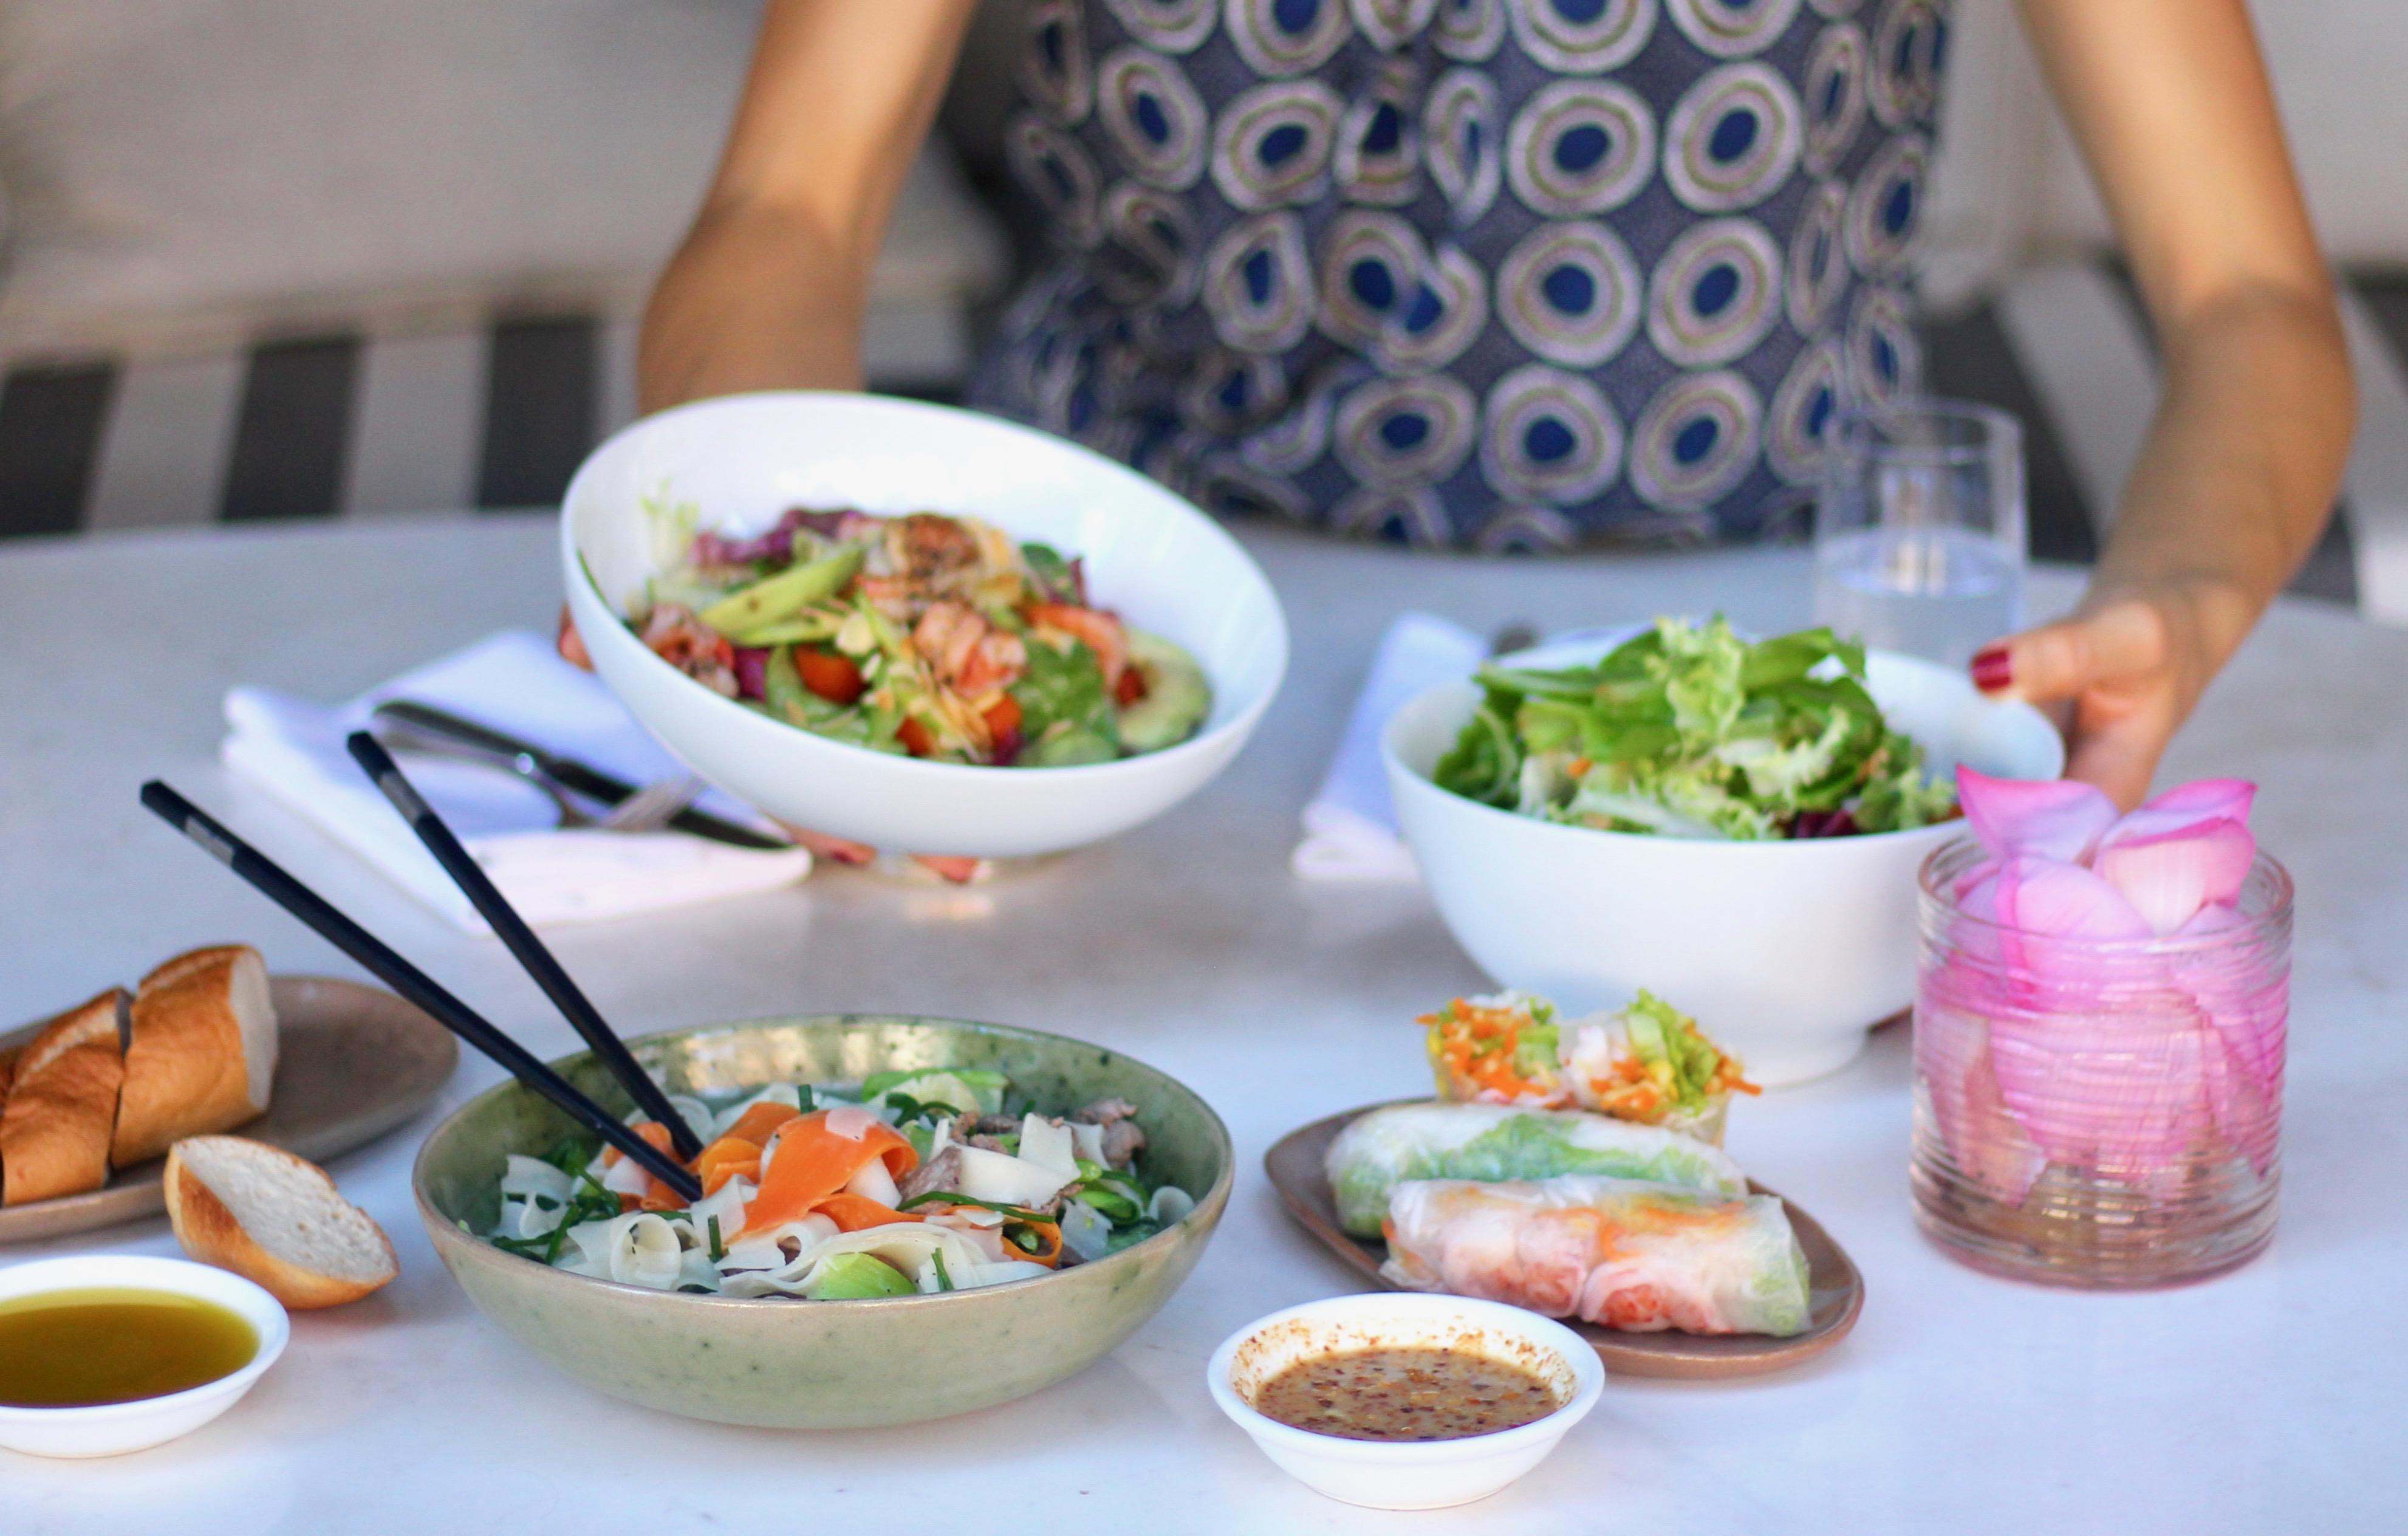 Green Mango Salad from the Chef at Park Hyatt Siem Reap